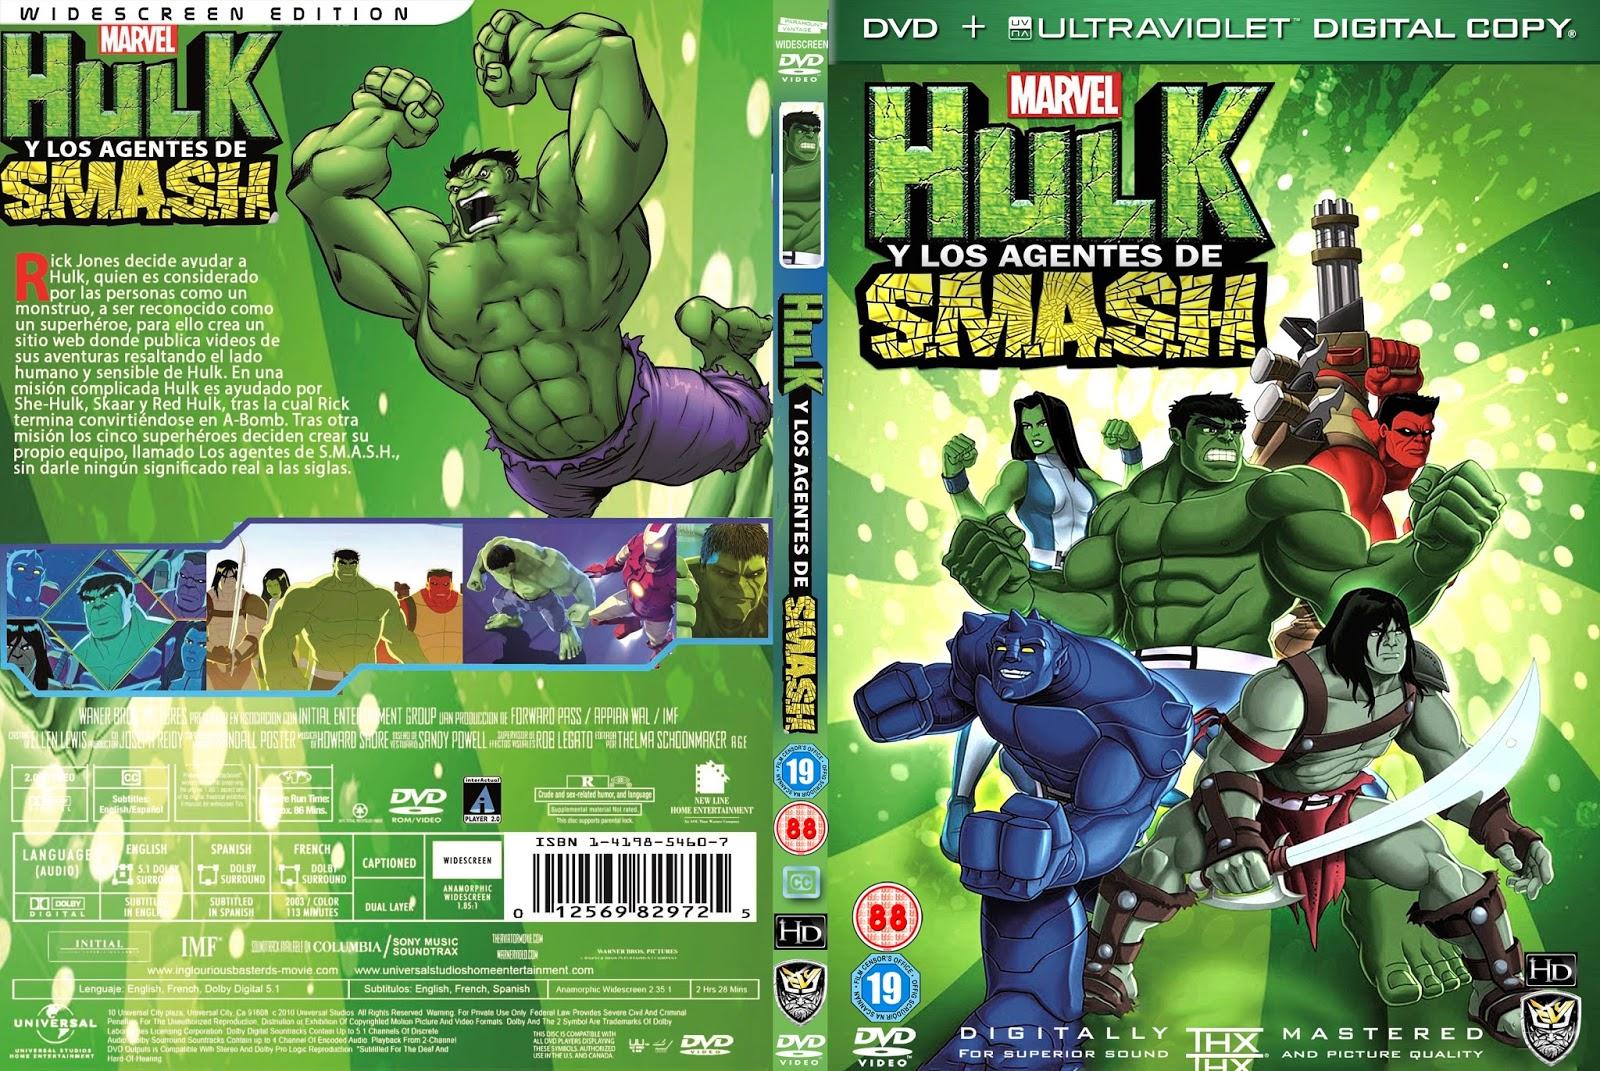 Hulk(wwwpagalworldcom)